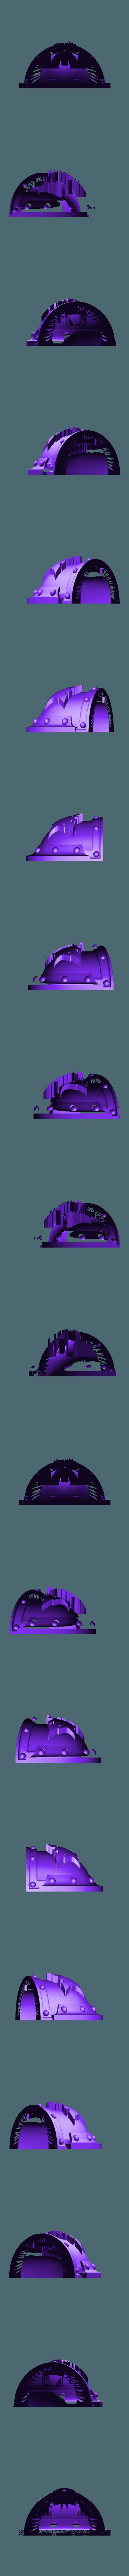 Morkai_Rep_MKIII_Pad.stl Download free STL file Double Wolf head Chapter insignia • 3D printing model, Tatsura